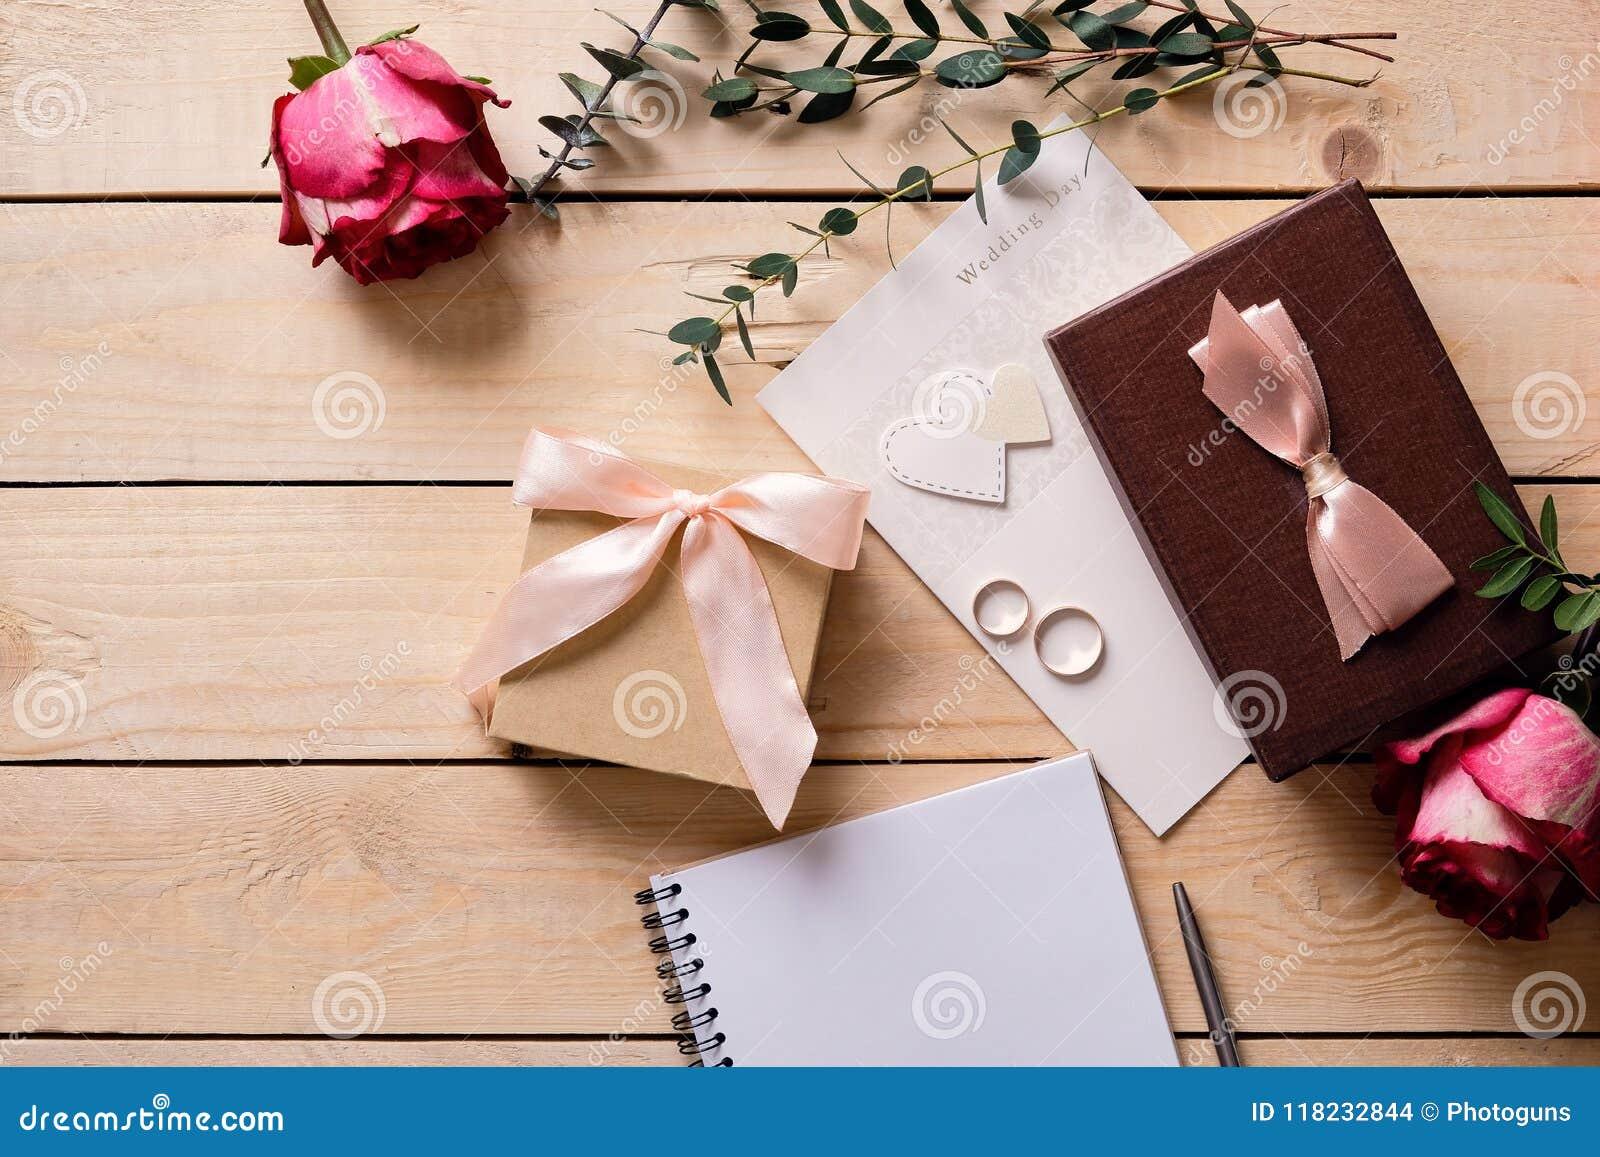 Red Rose Love Letter Wedding Invitations